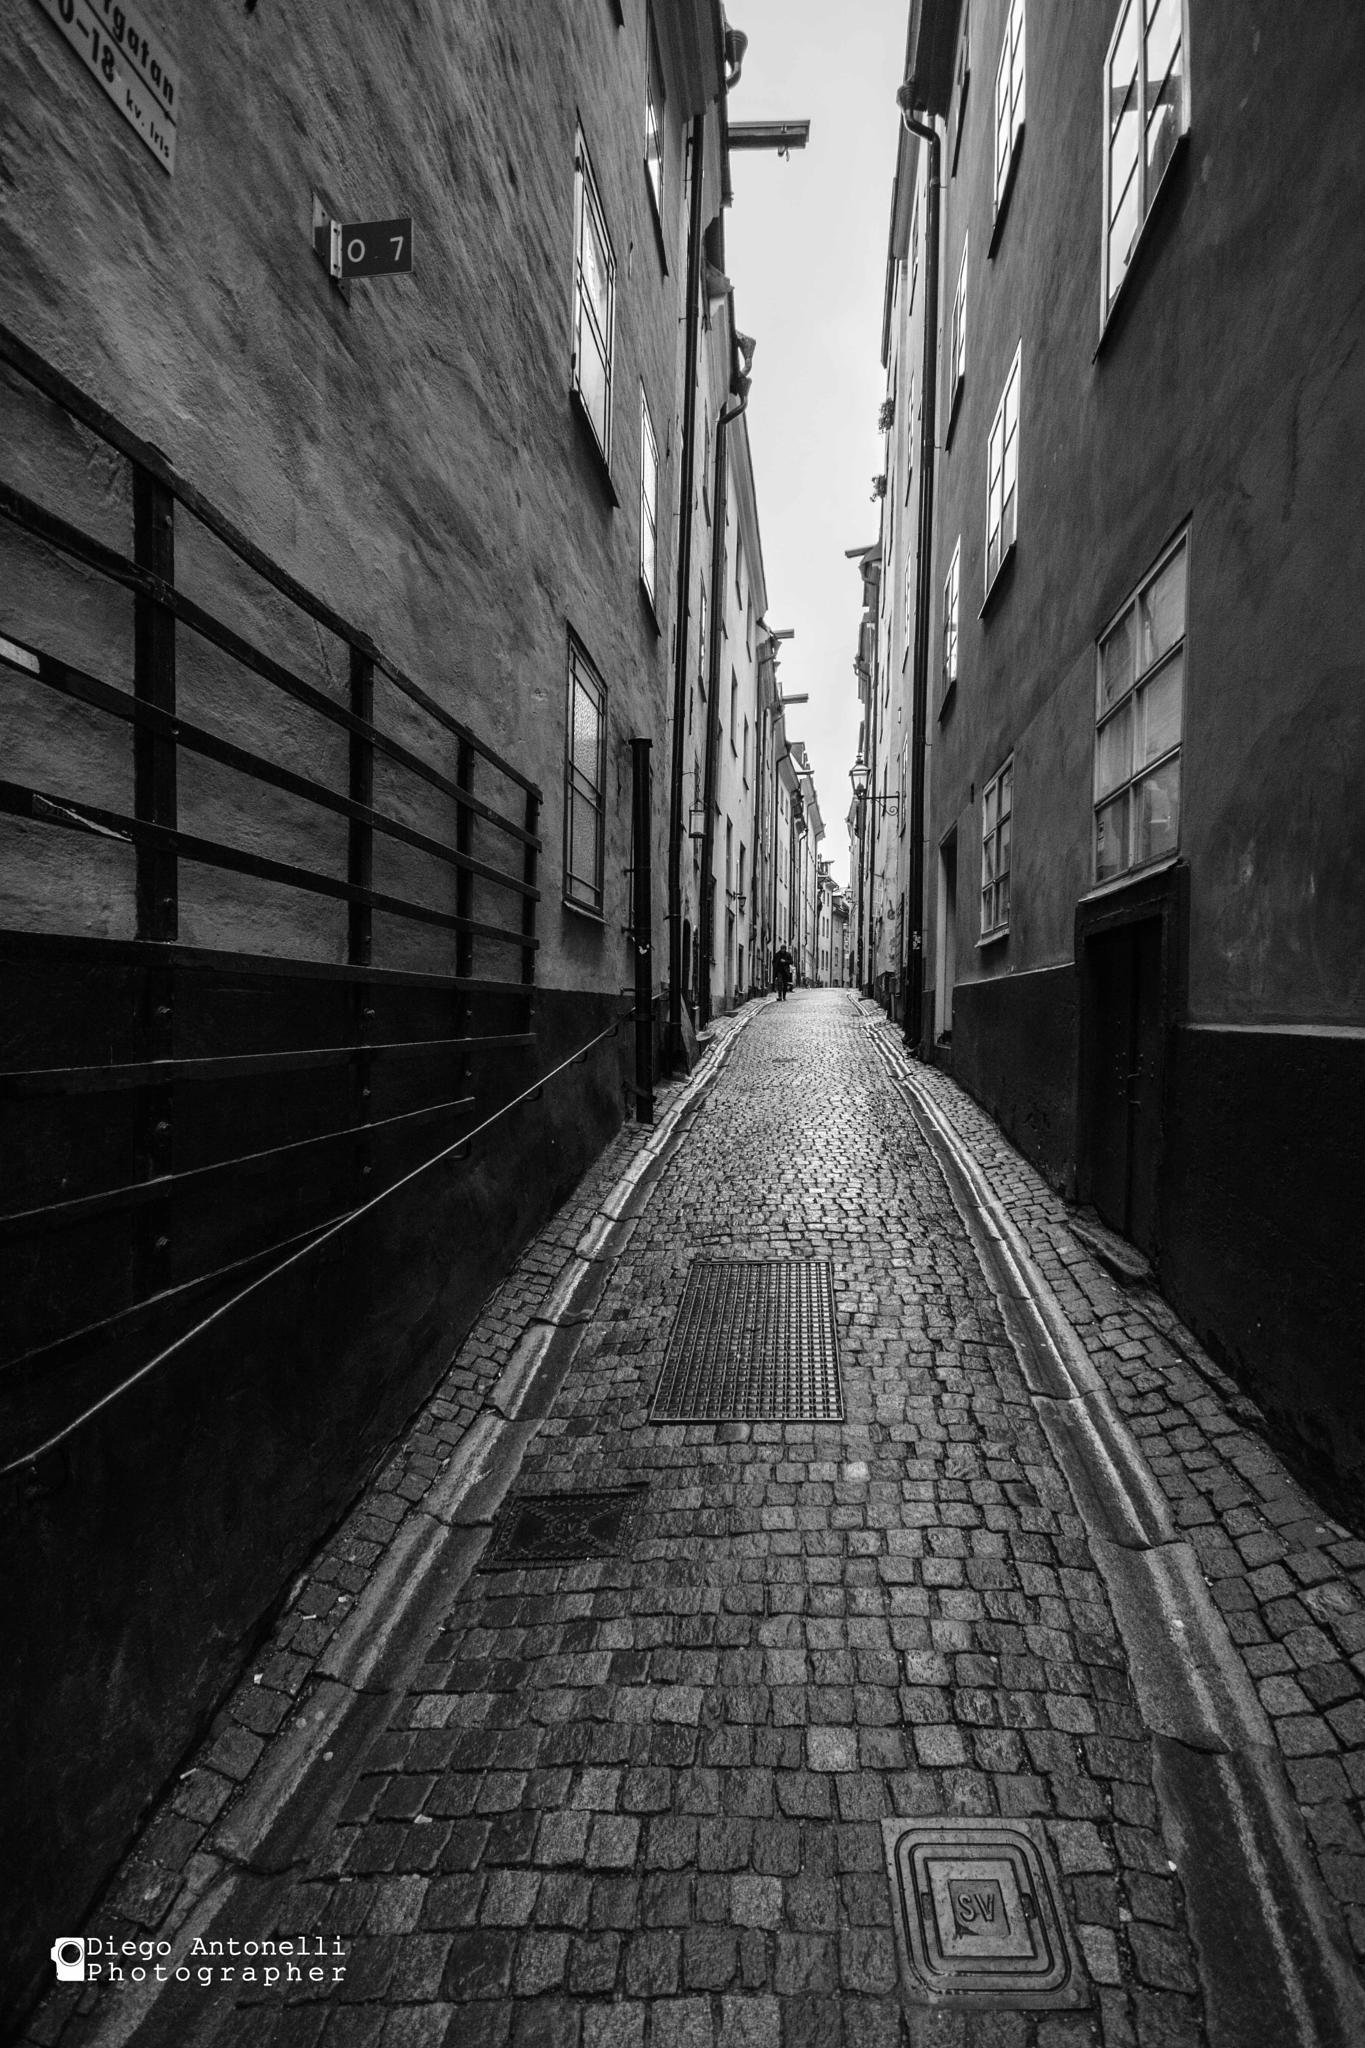 walking. Alone by DiegoPh